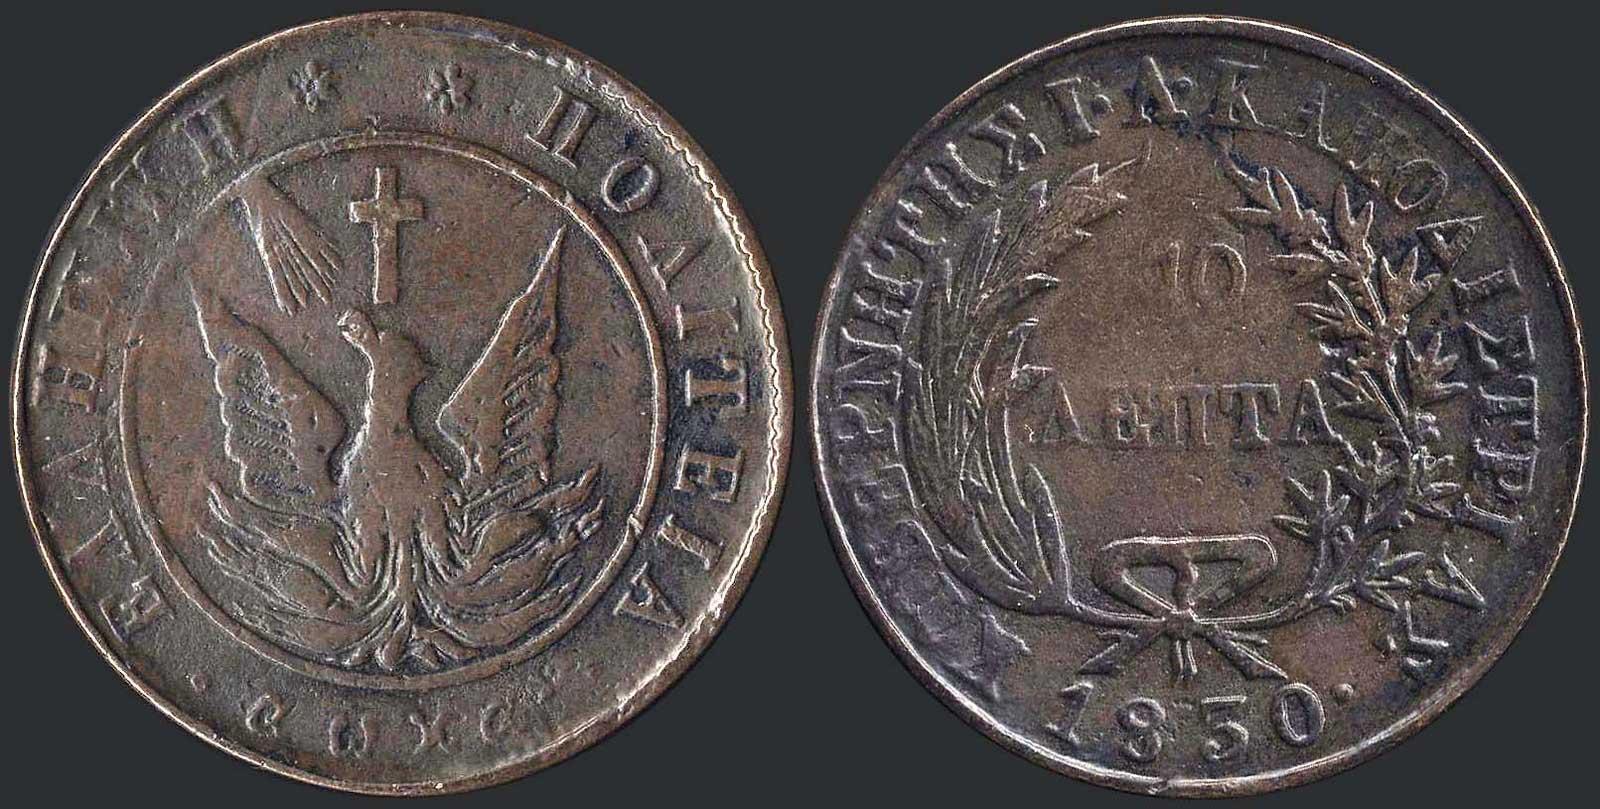 Lot 9022 - GREECE-  COINS & TOKENS governor capodistrias -  A. Karamitsos Public & LIVE Bid Auction 606 Coins, Medals & Banknotes